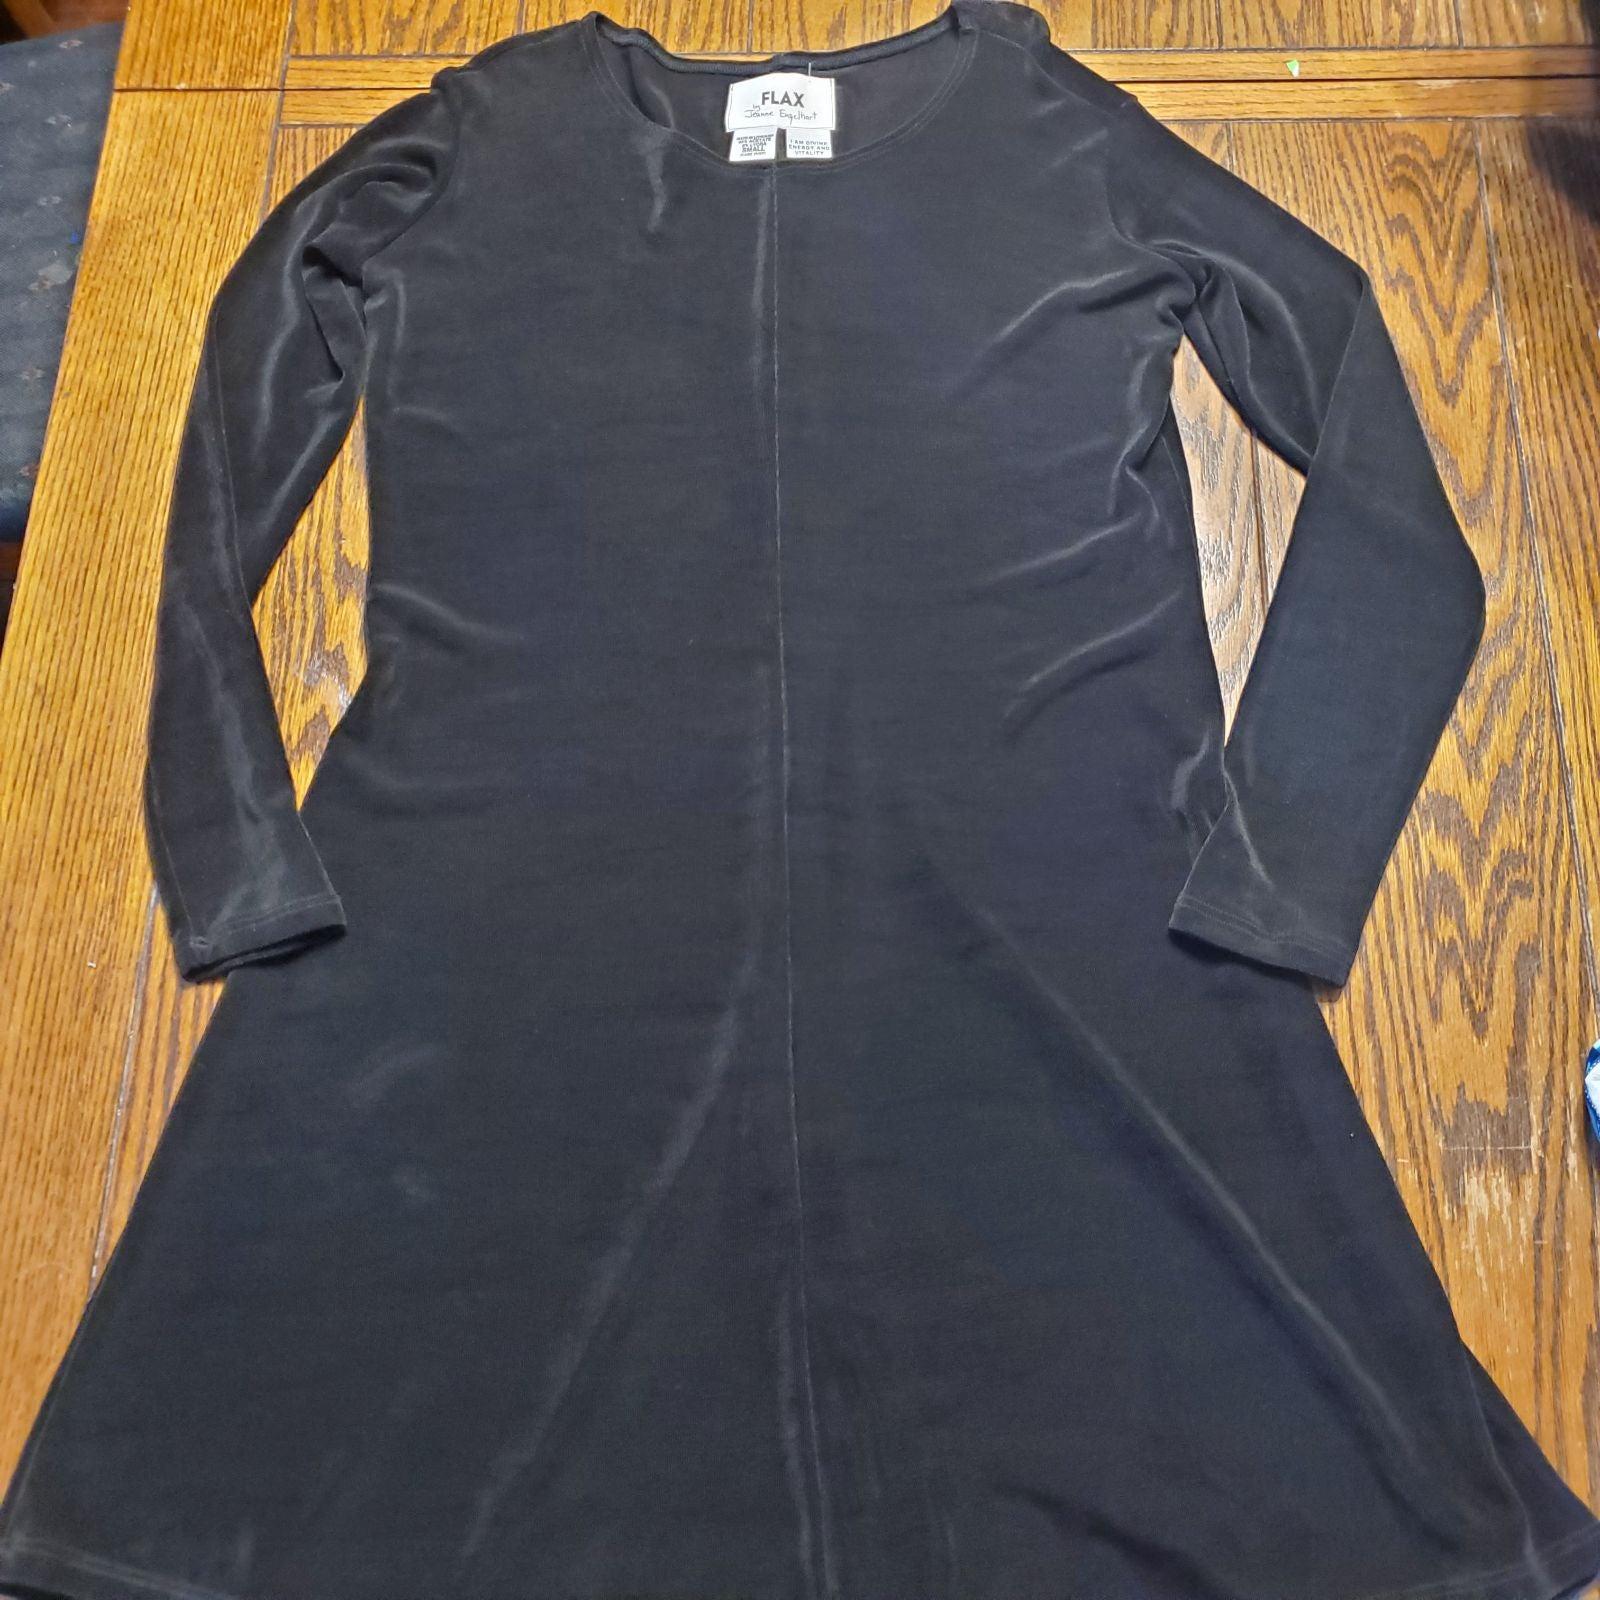 Flax brand black  acetate dress long sle